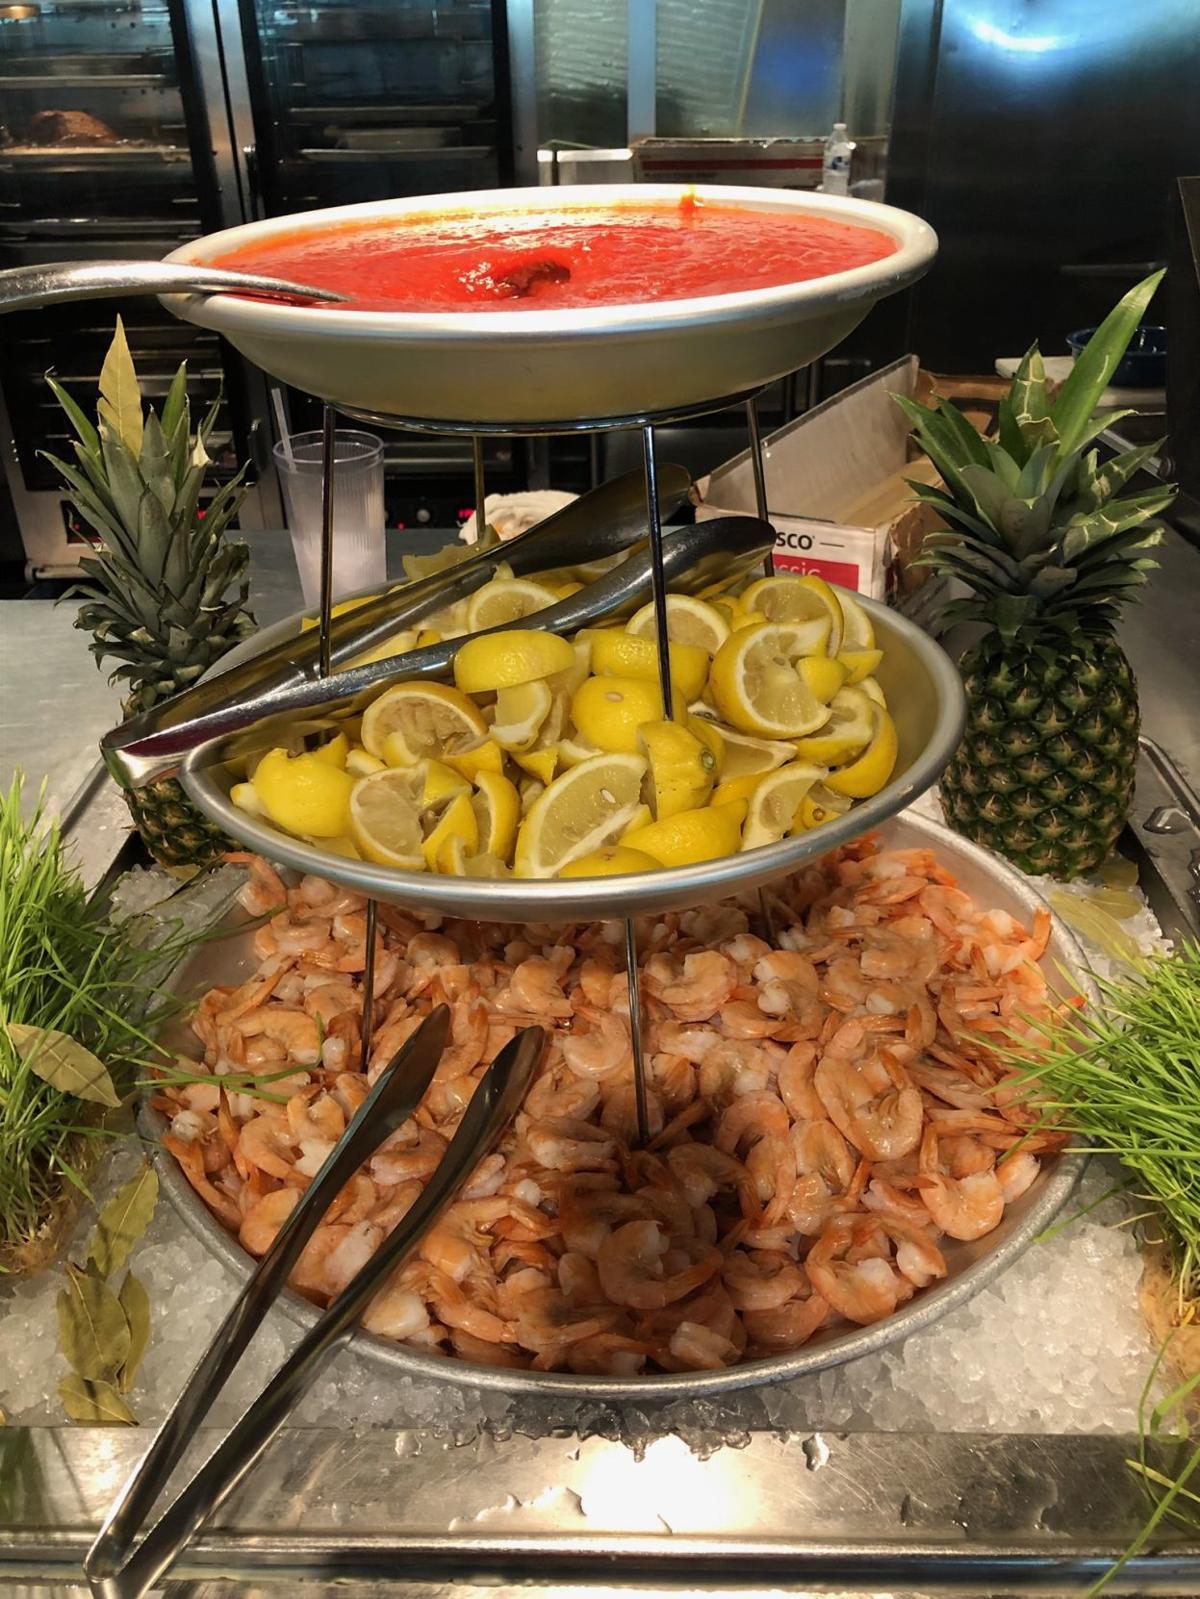 Ananas Buffet restaurant scene: enjoy sunday brunch at harbor view buffet | food